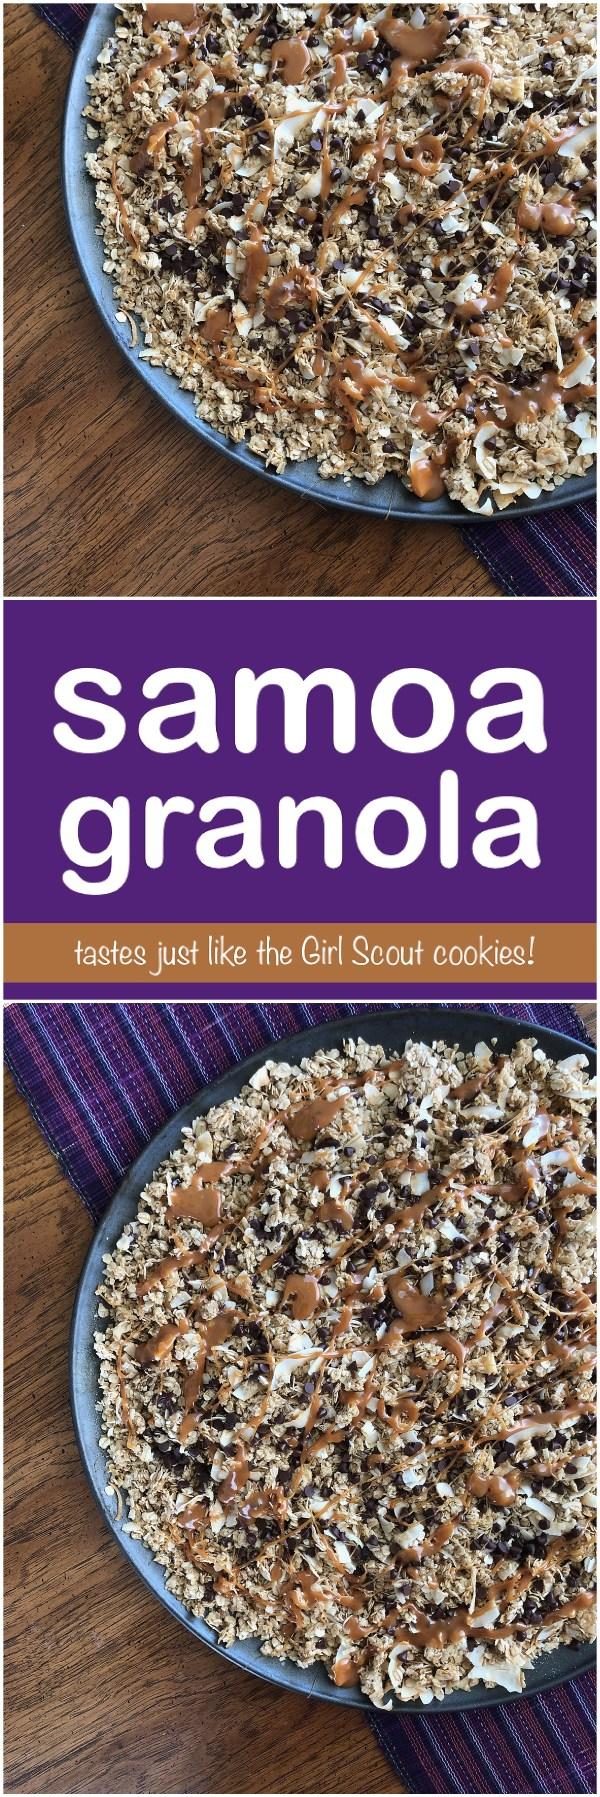 Samoa Granola | Samoa Copycat | Samoa Cookies | Girl Scout Cookies | Easy Recipe | Breakfast | Meal Planning | Breakfast Ideas | After School Snack | Coconut | Caramel | Chocolate | Homemade Granola | Six Clever Sisters